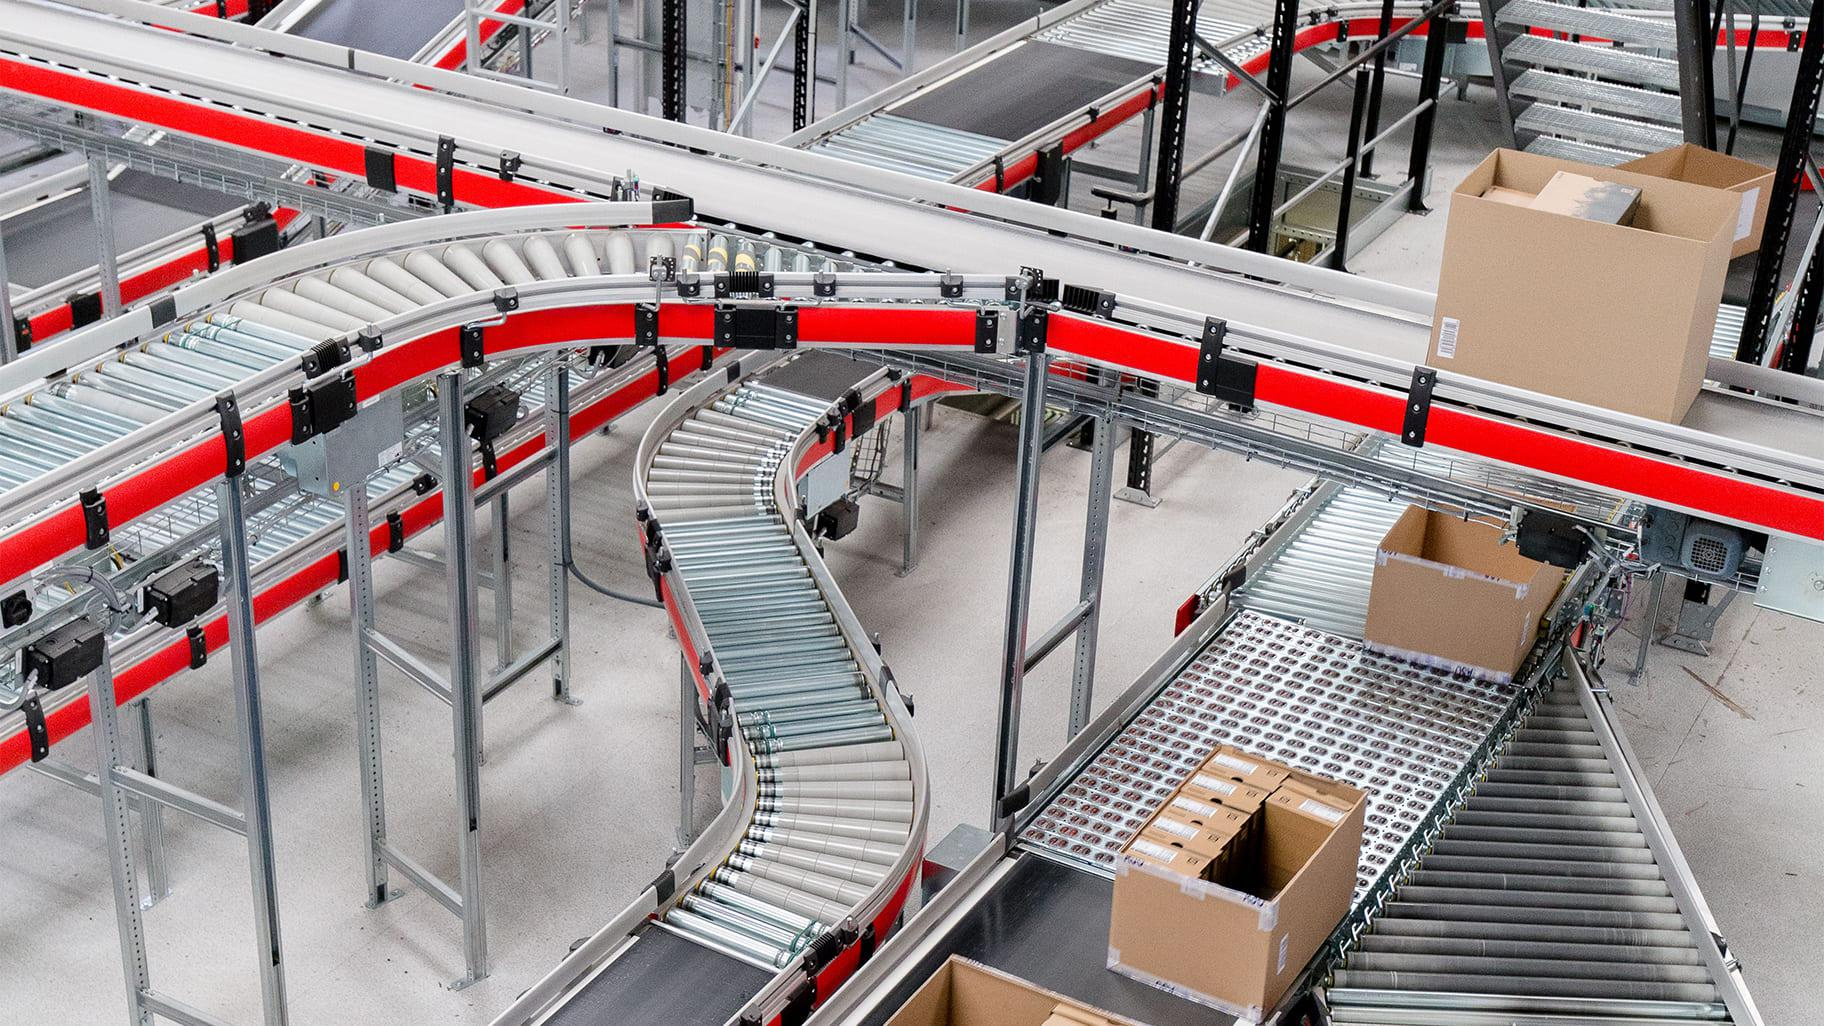 XPO conveyors 16x27